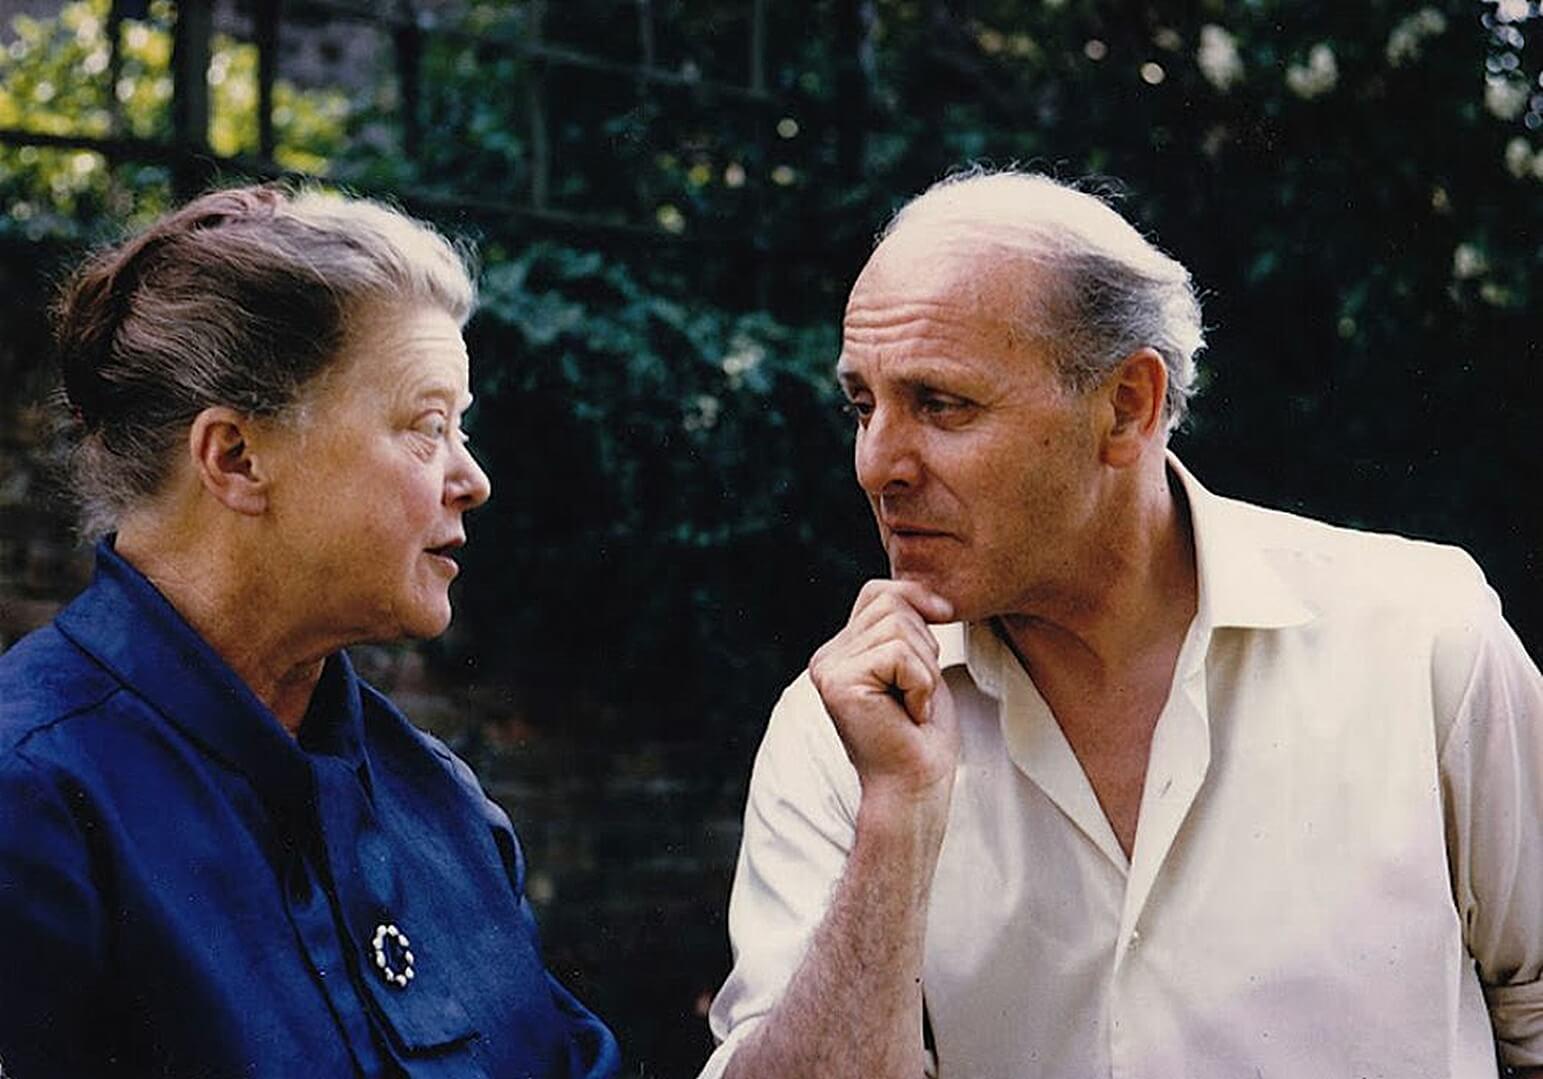 Val and John Morley